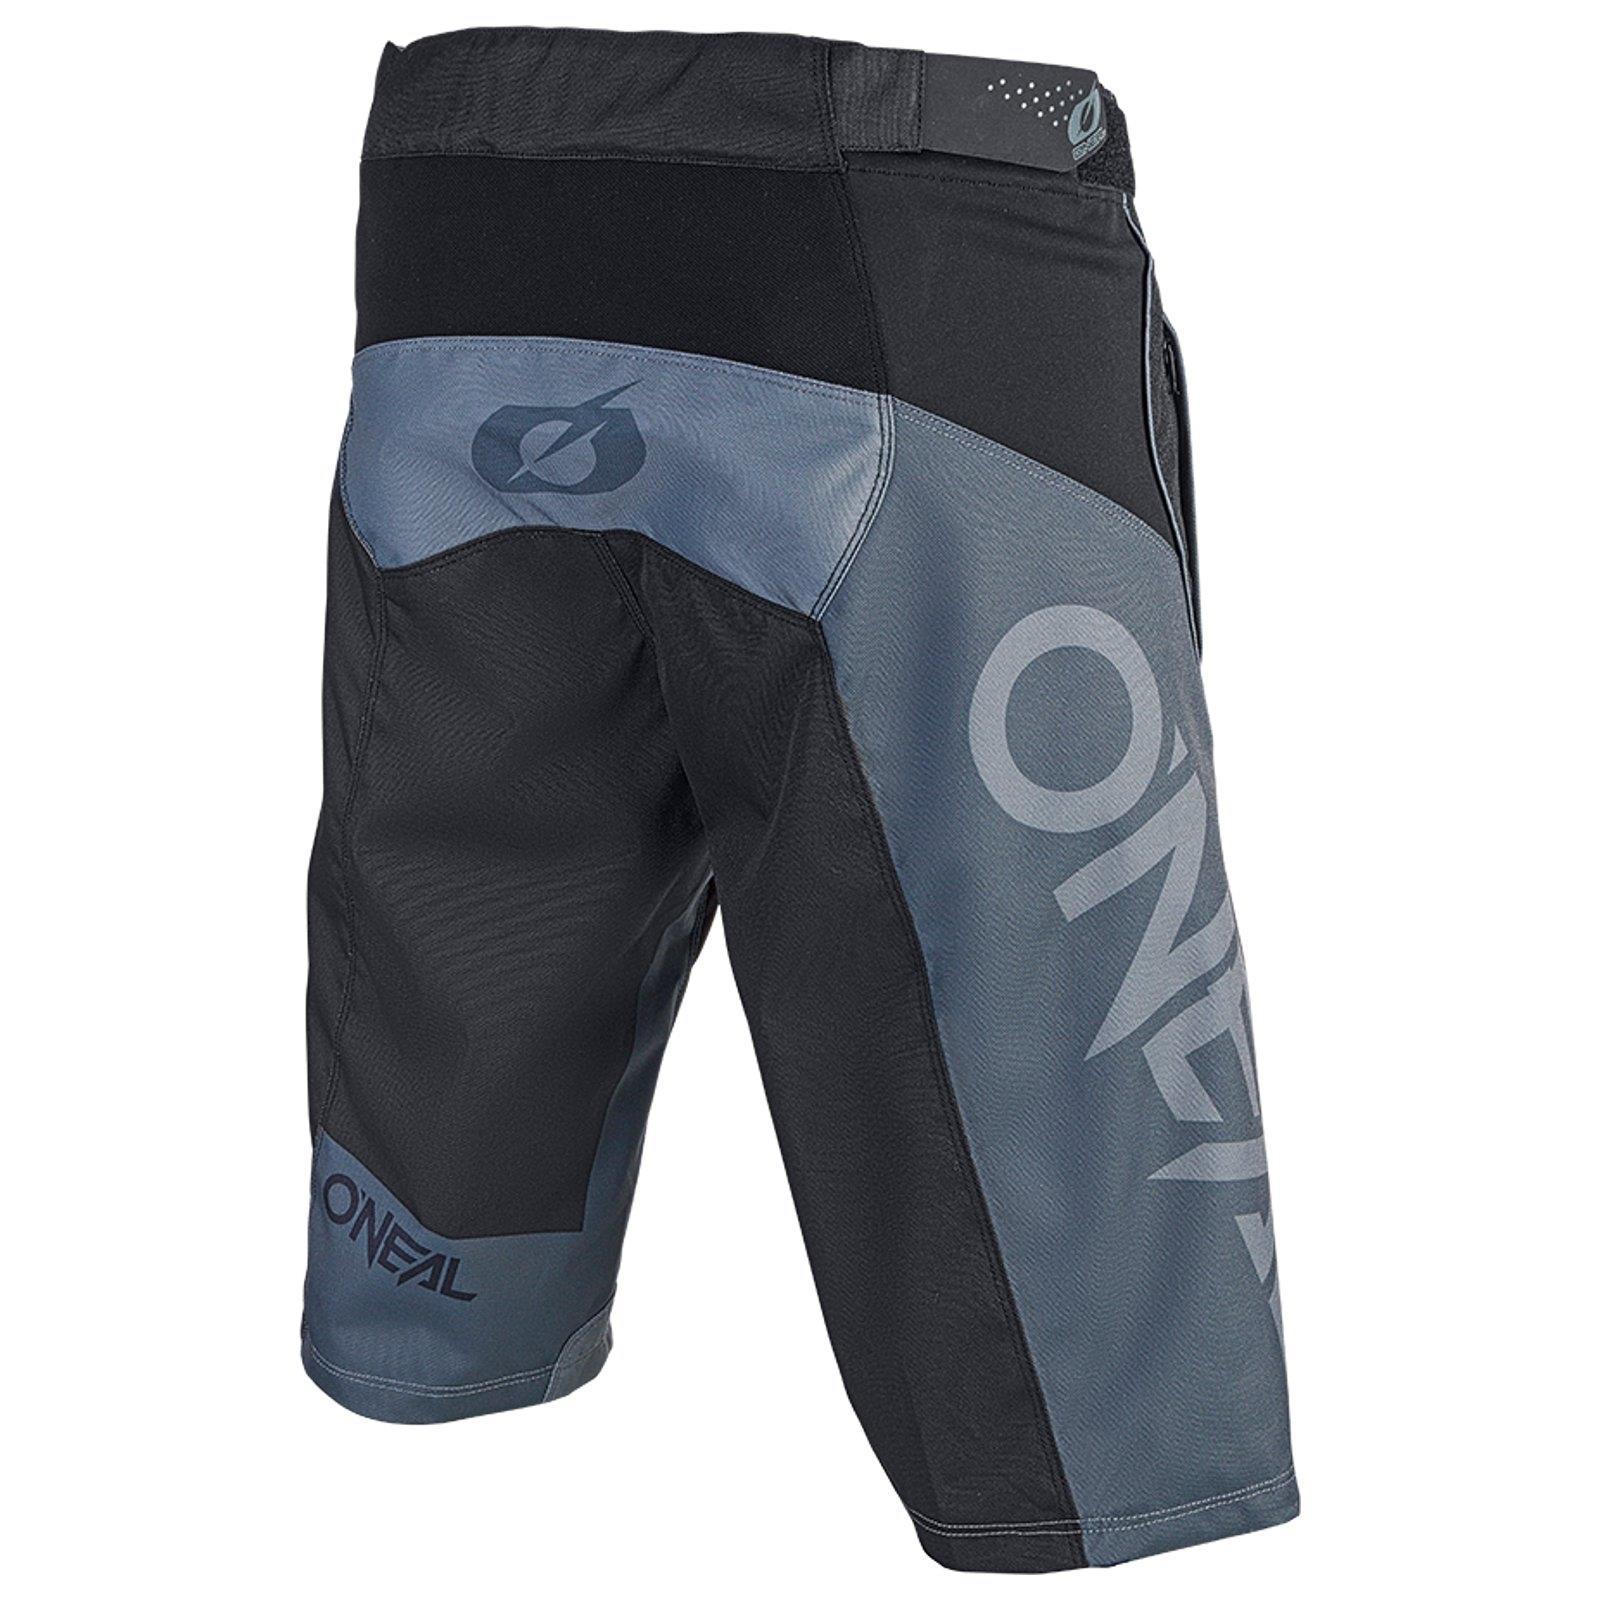 ONeal-pantalones-de-Jersey-de-los-ninos-de-pantalones-cortos-ninos-MX-bicicleta-DH-montana-bicicleta miniatura 135